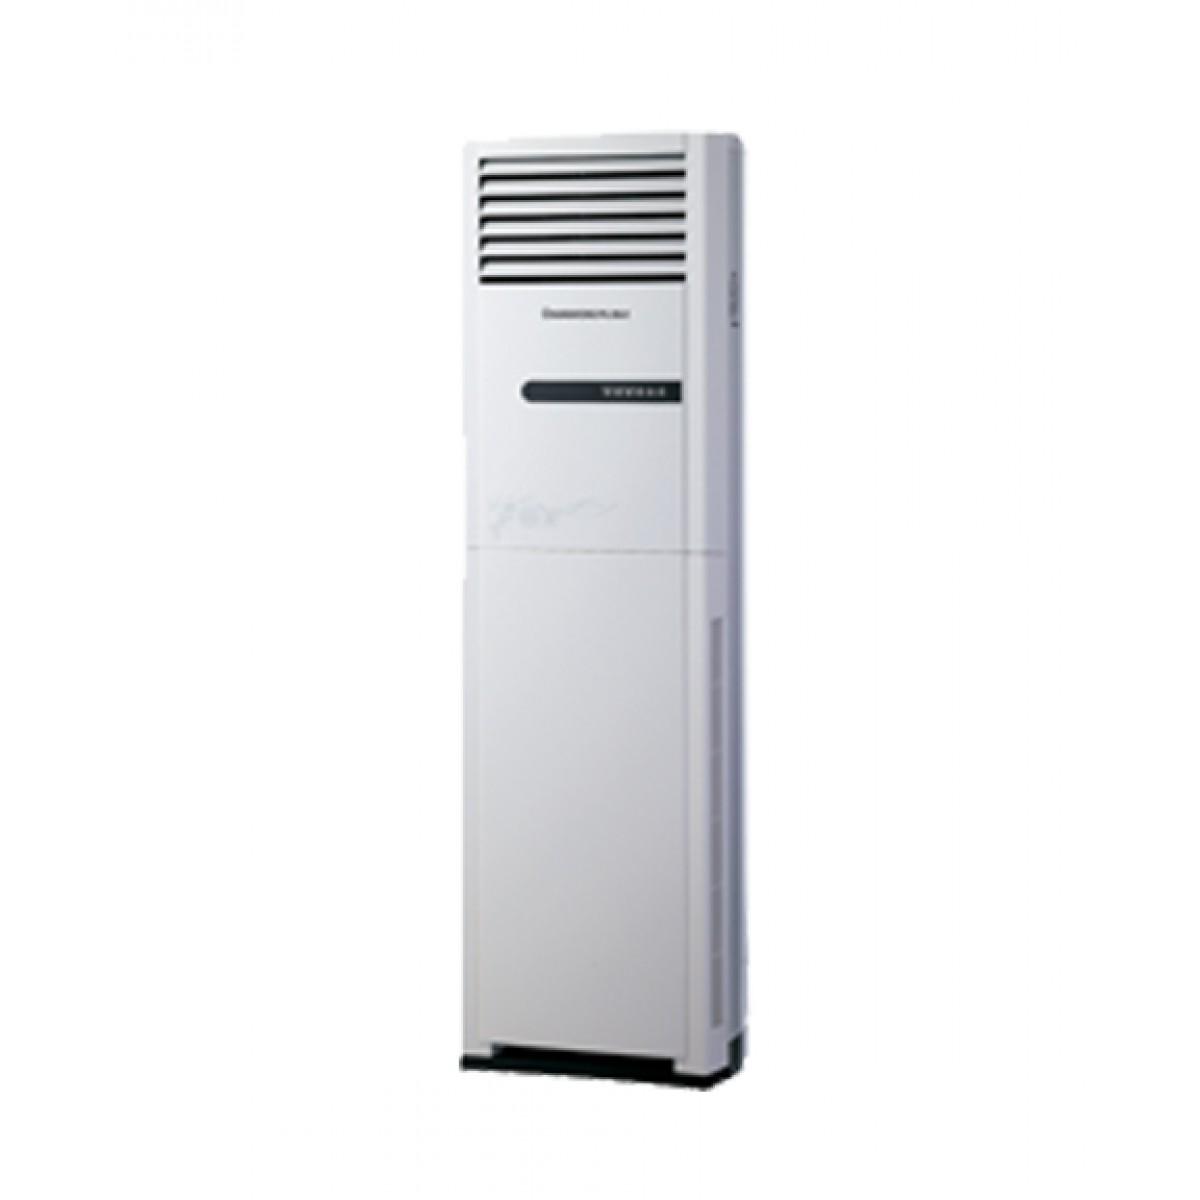 Changhong ruba floor standing air conditioner 2 0 ton kf for 1 ton floor standing ac